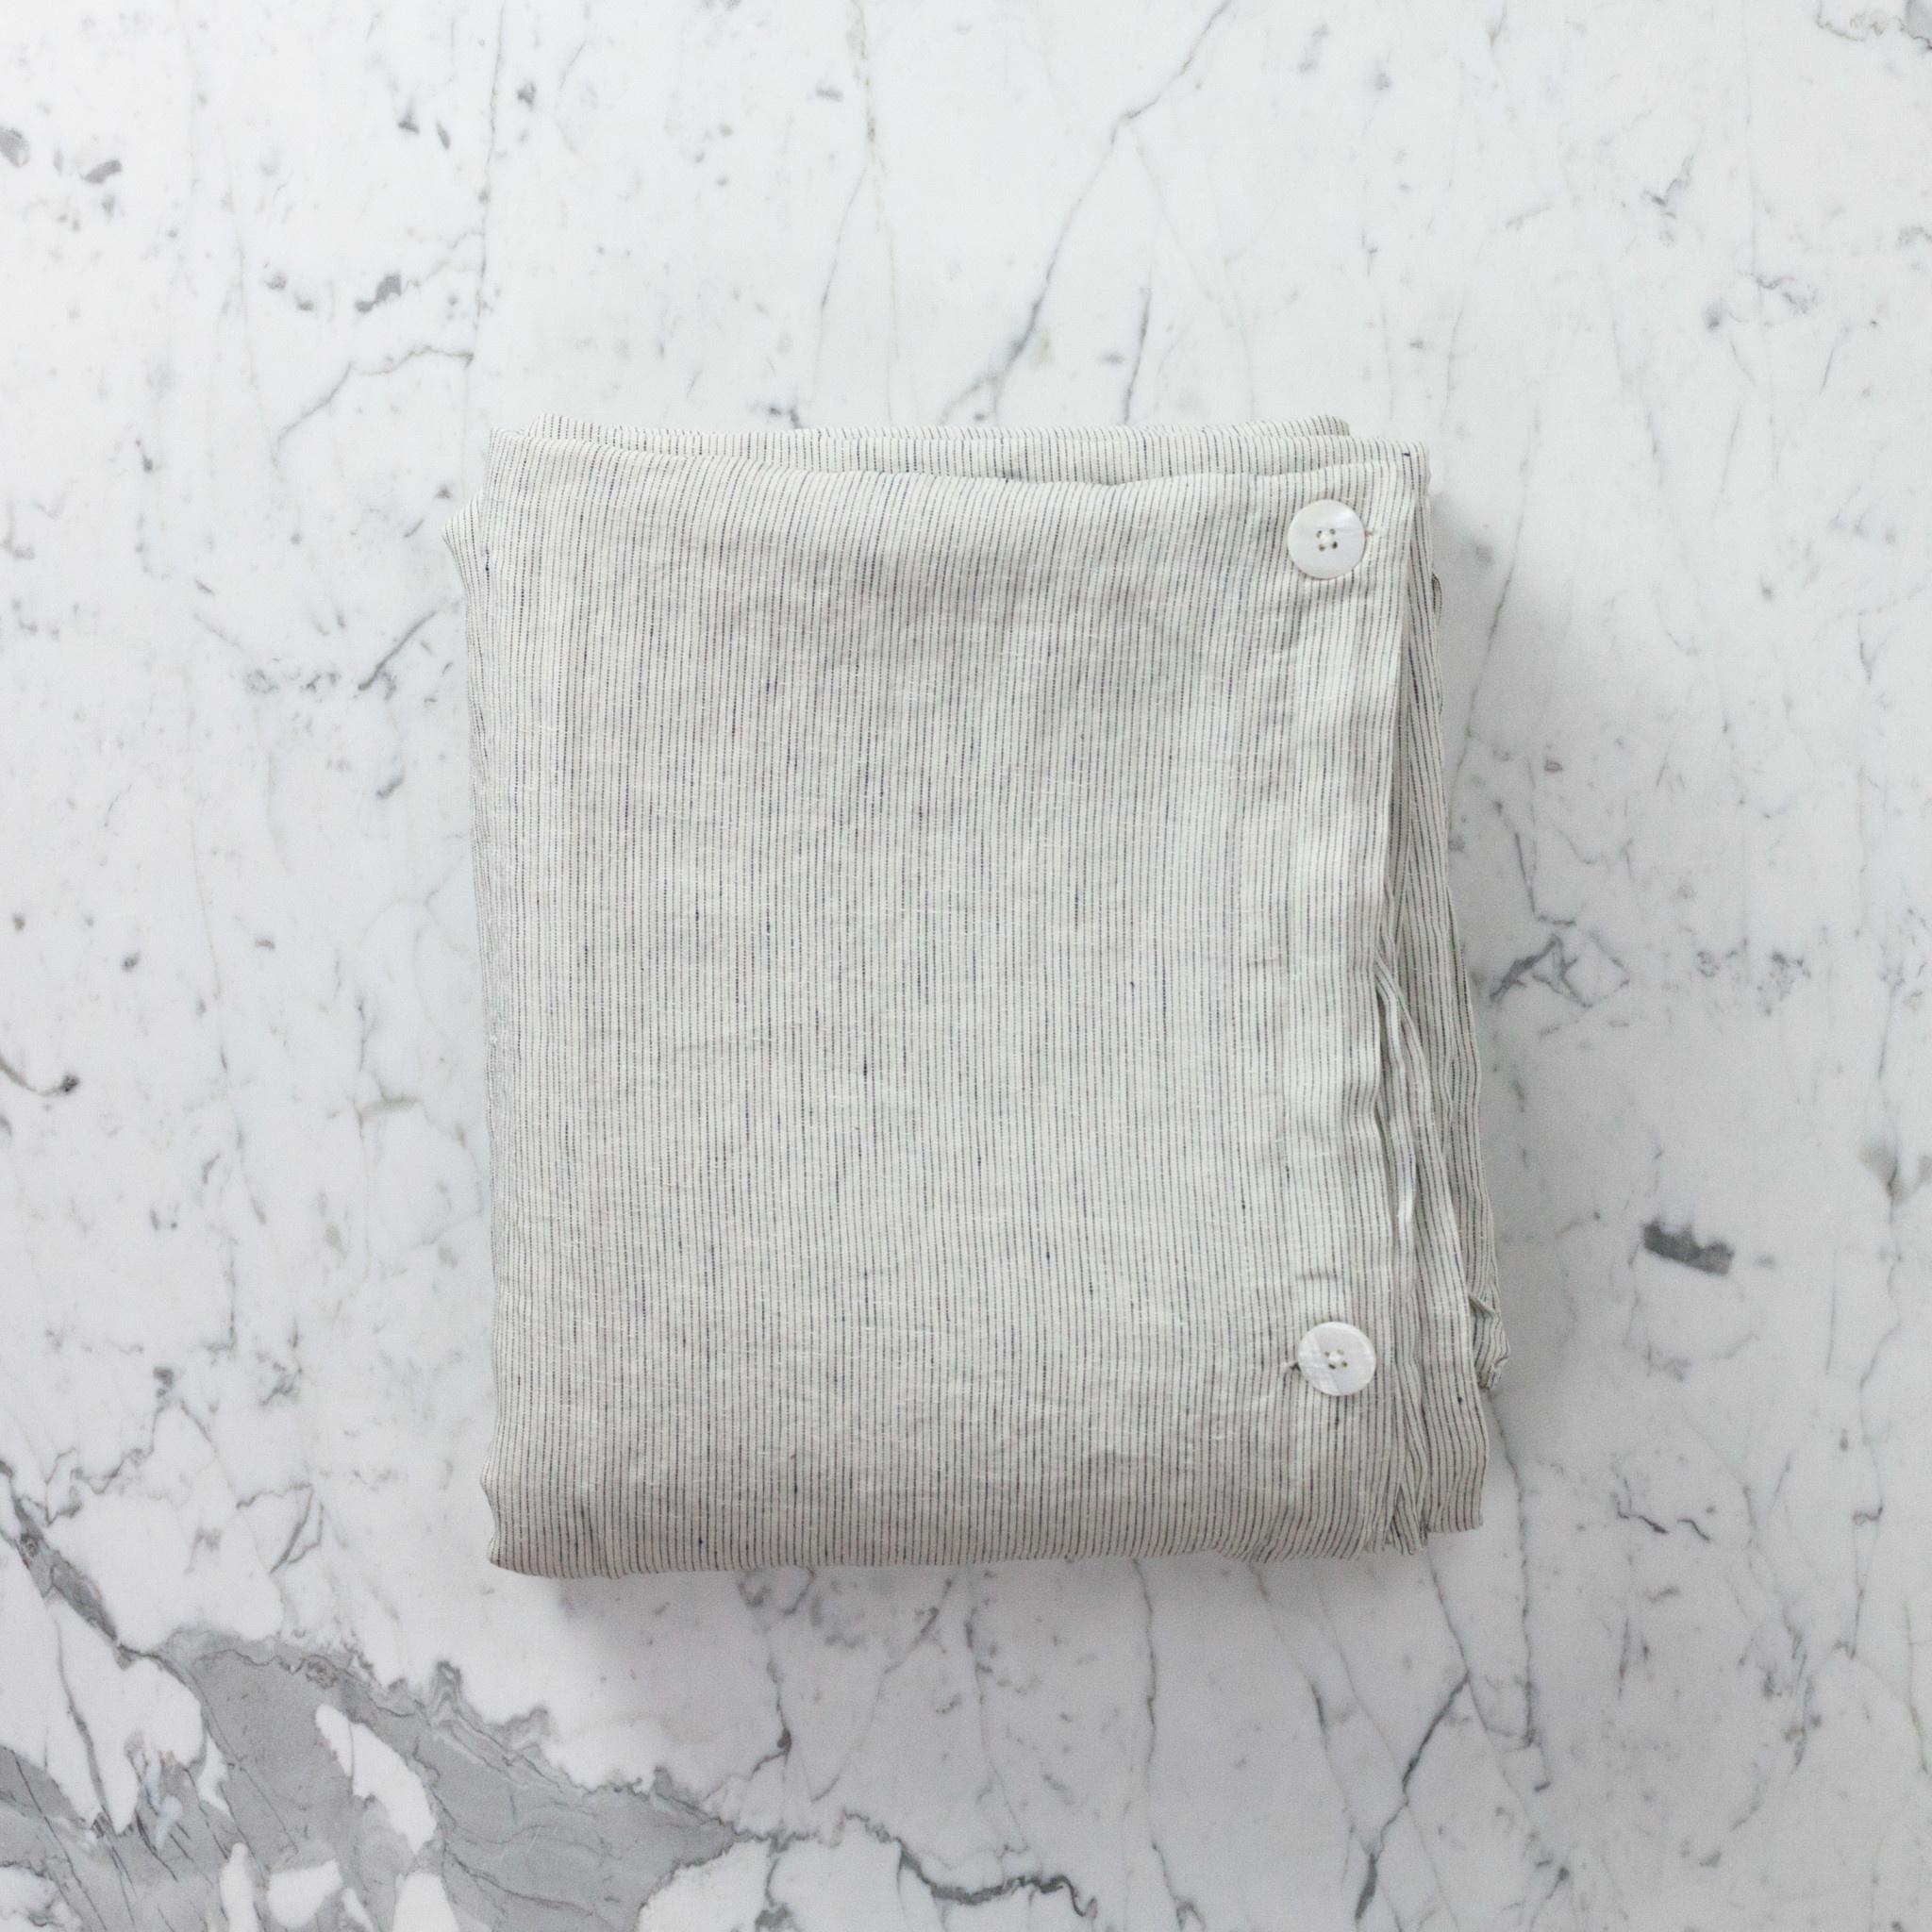 Linen Duvet Cover King Pinstripe 108 X 96 The Foundry Home Goods